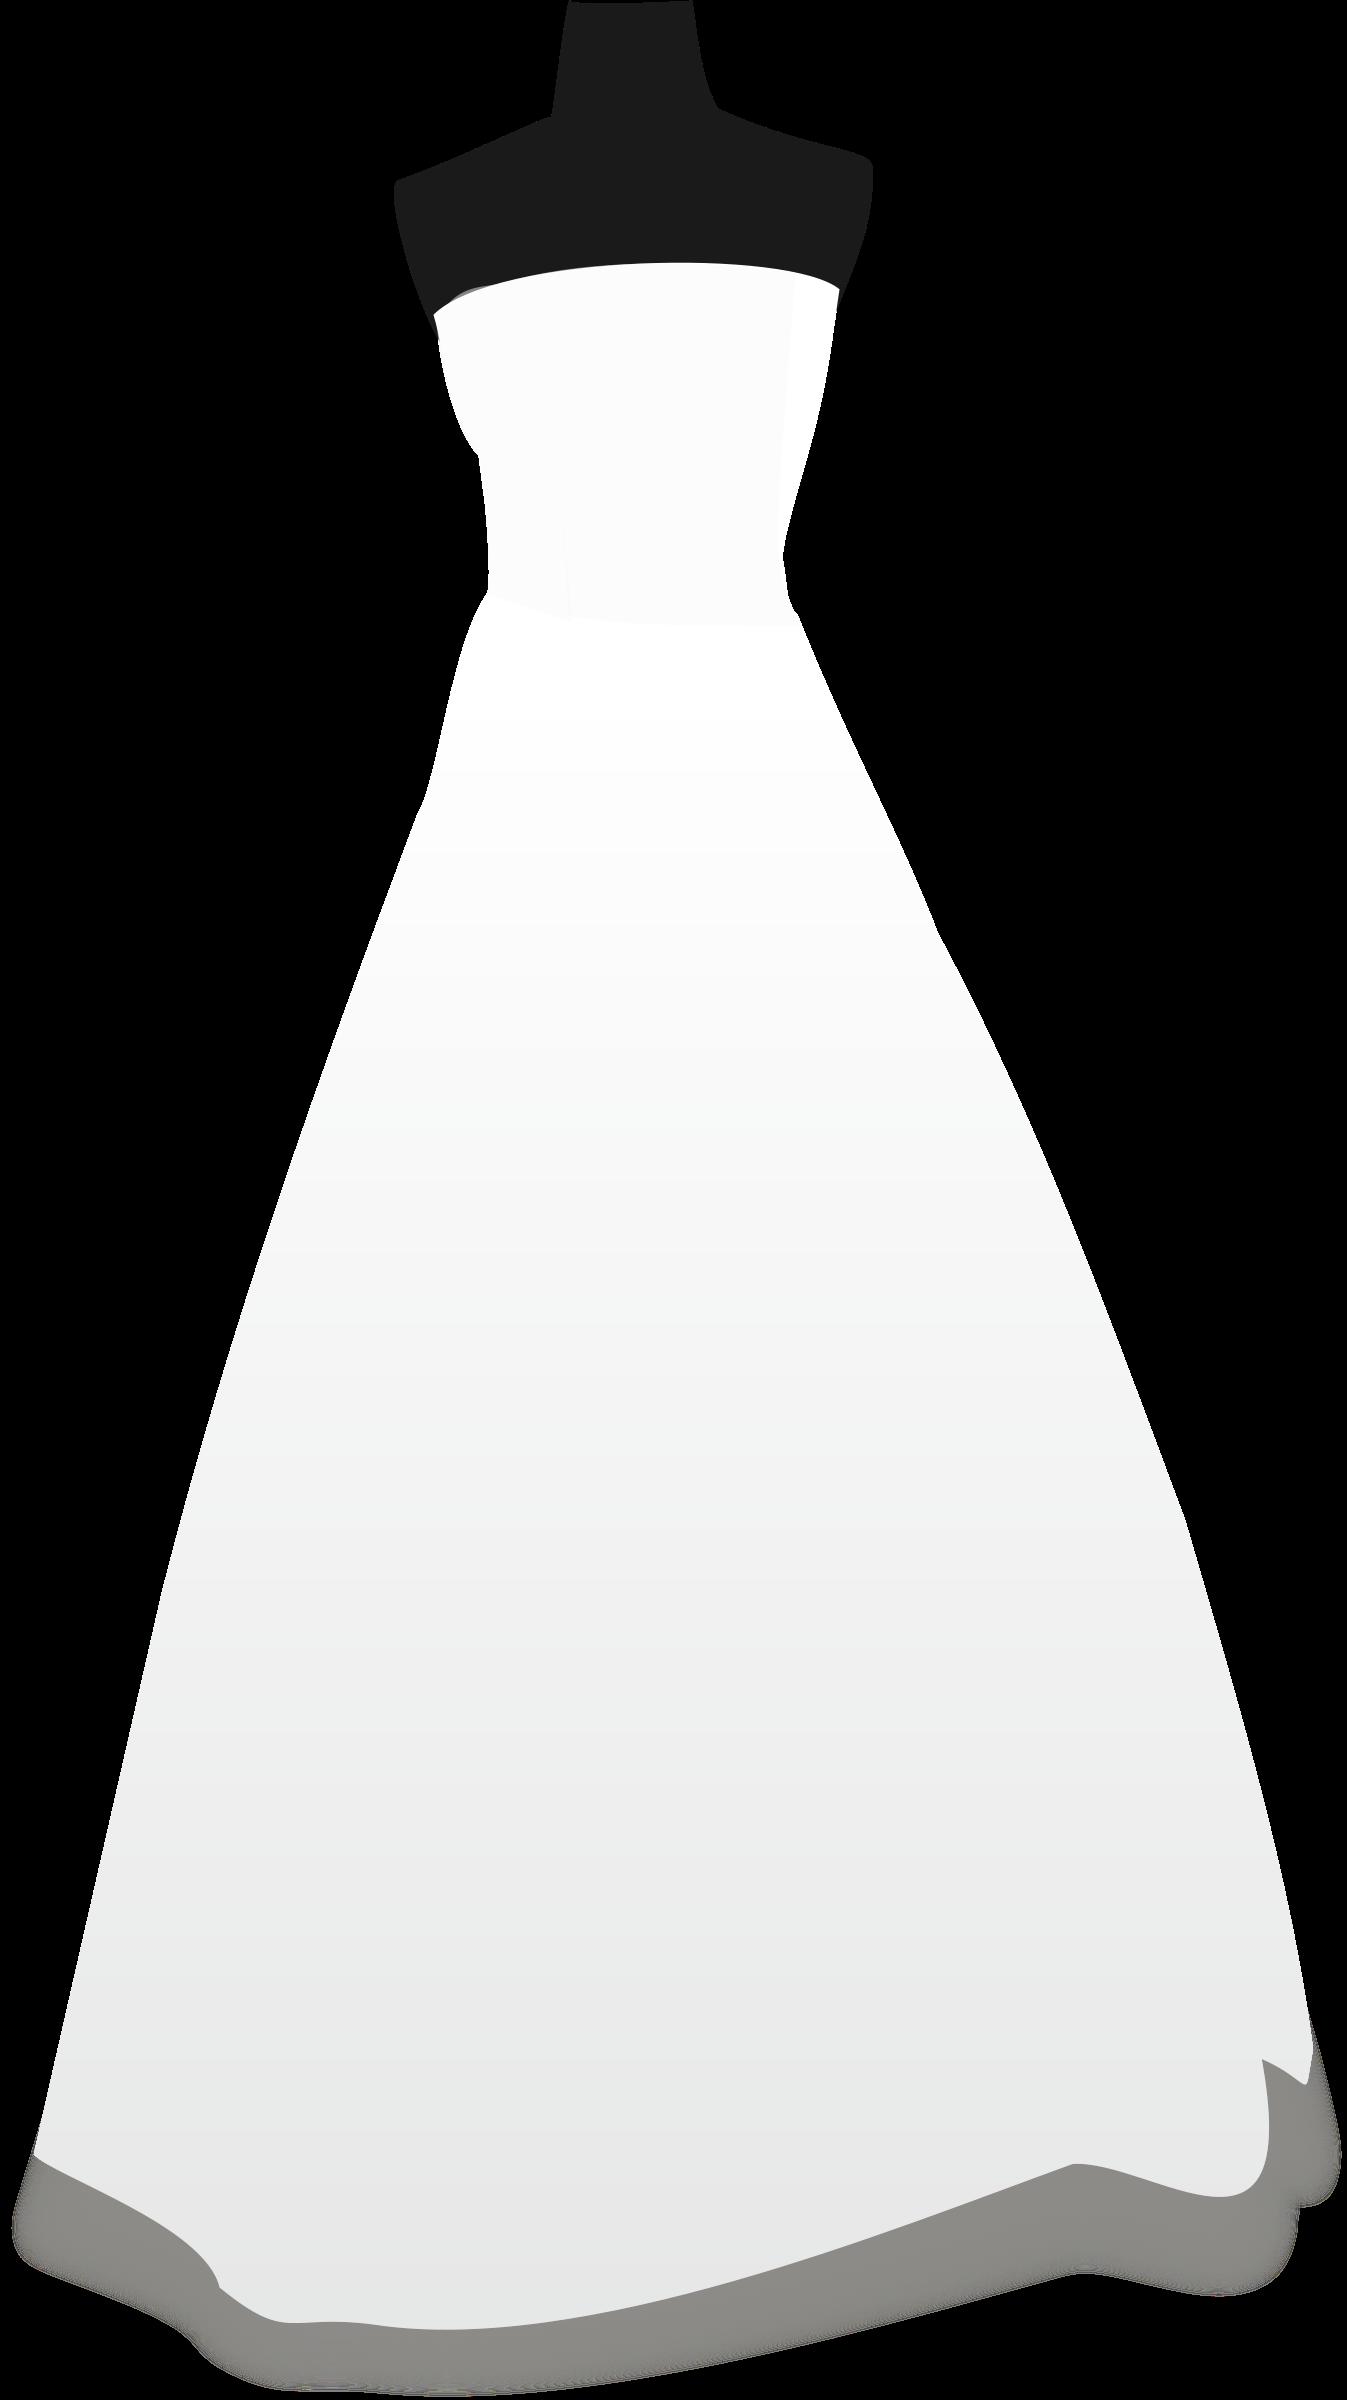 Clipart png wedding. Dress panda free images